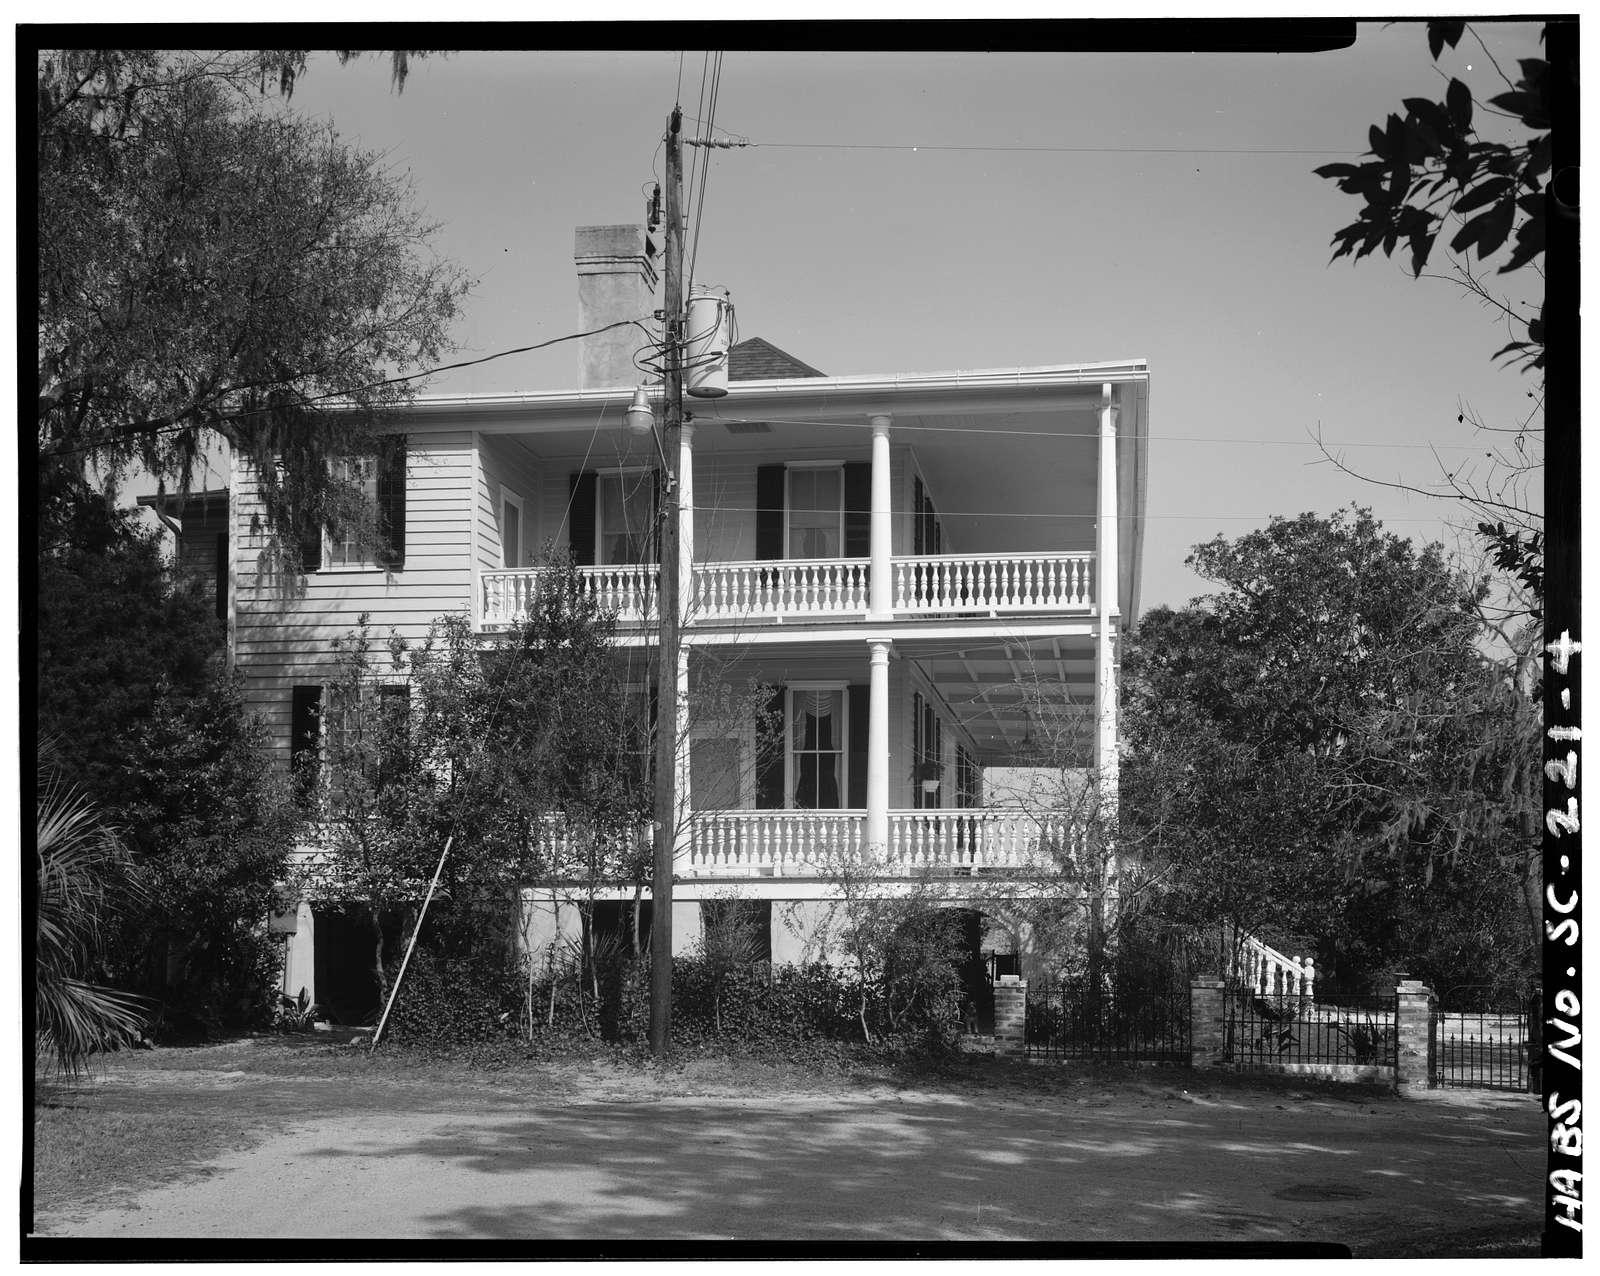 Thomas E. Ledbetter House, 411 Bayard Street, Beaufort, Beaufort County, SC